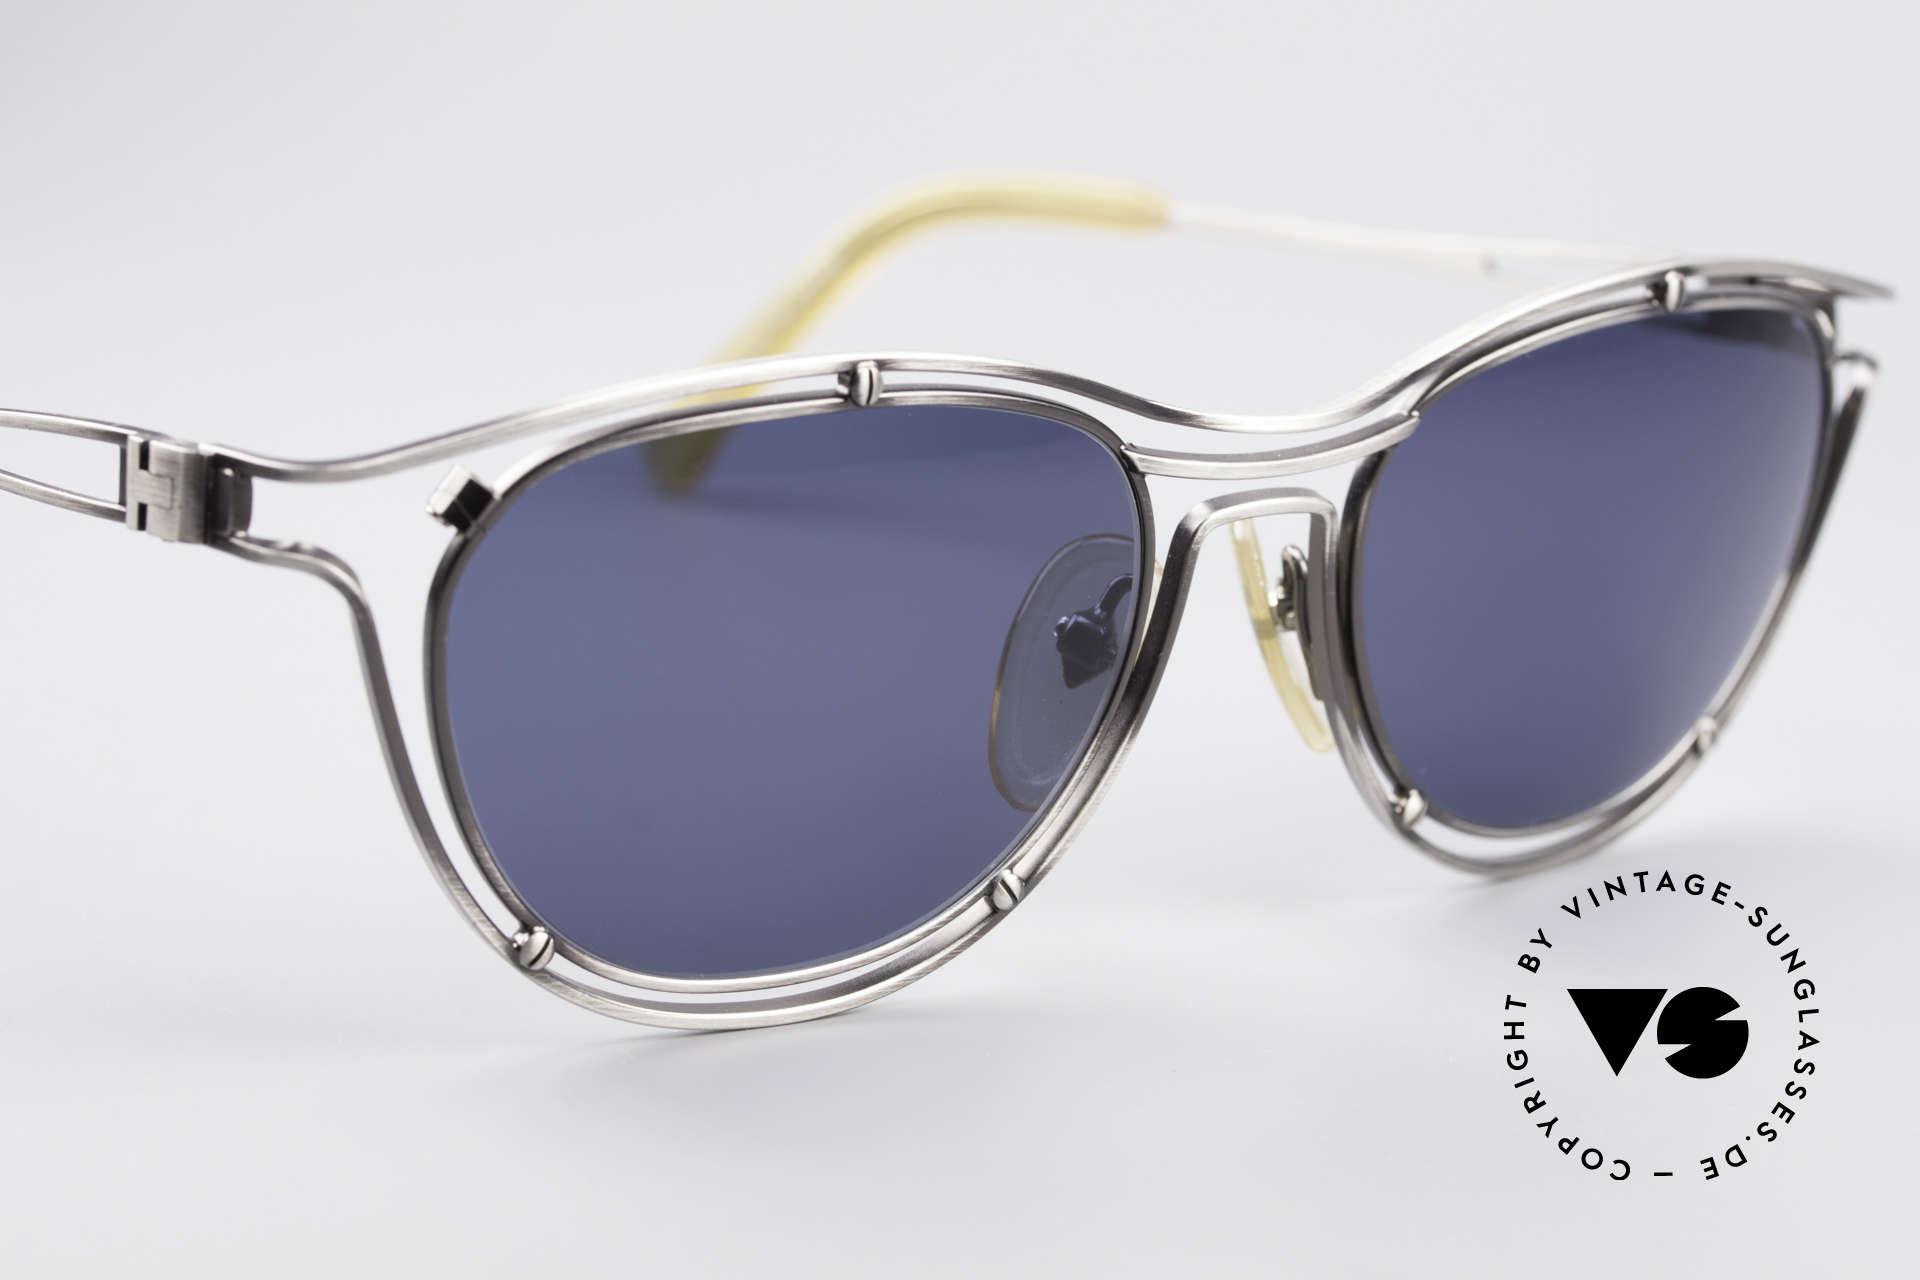 Jean Paul Gaultier 56-2176 True Designer Sunglasses, unworn (like all our old 90's designer sunglasses), Made for Men and Women